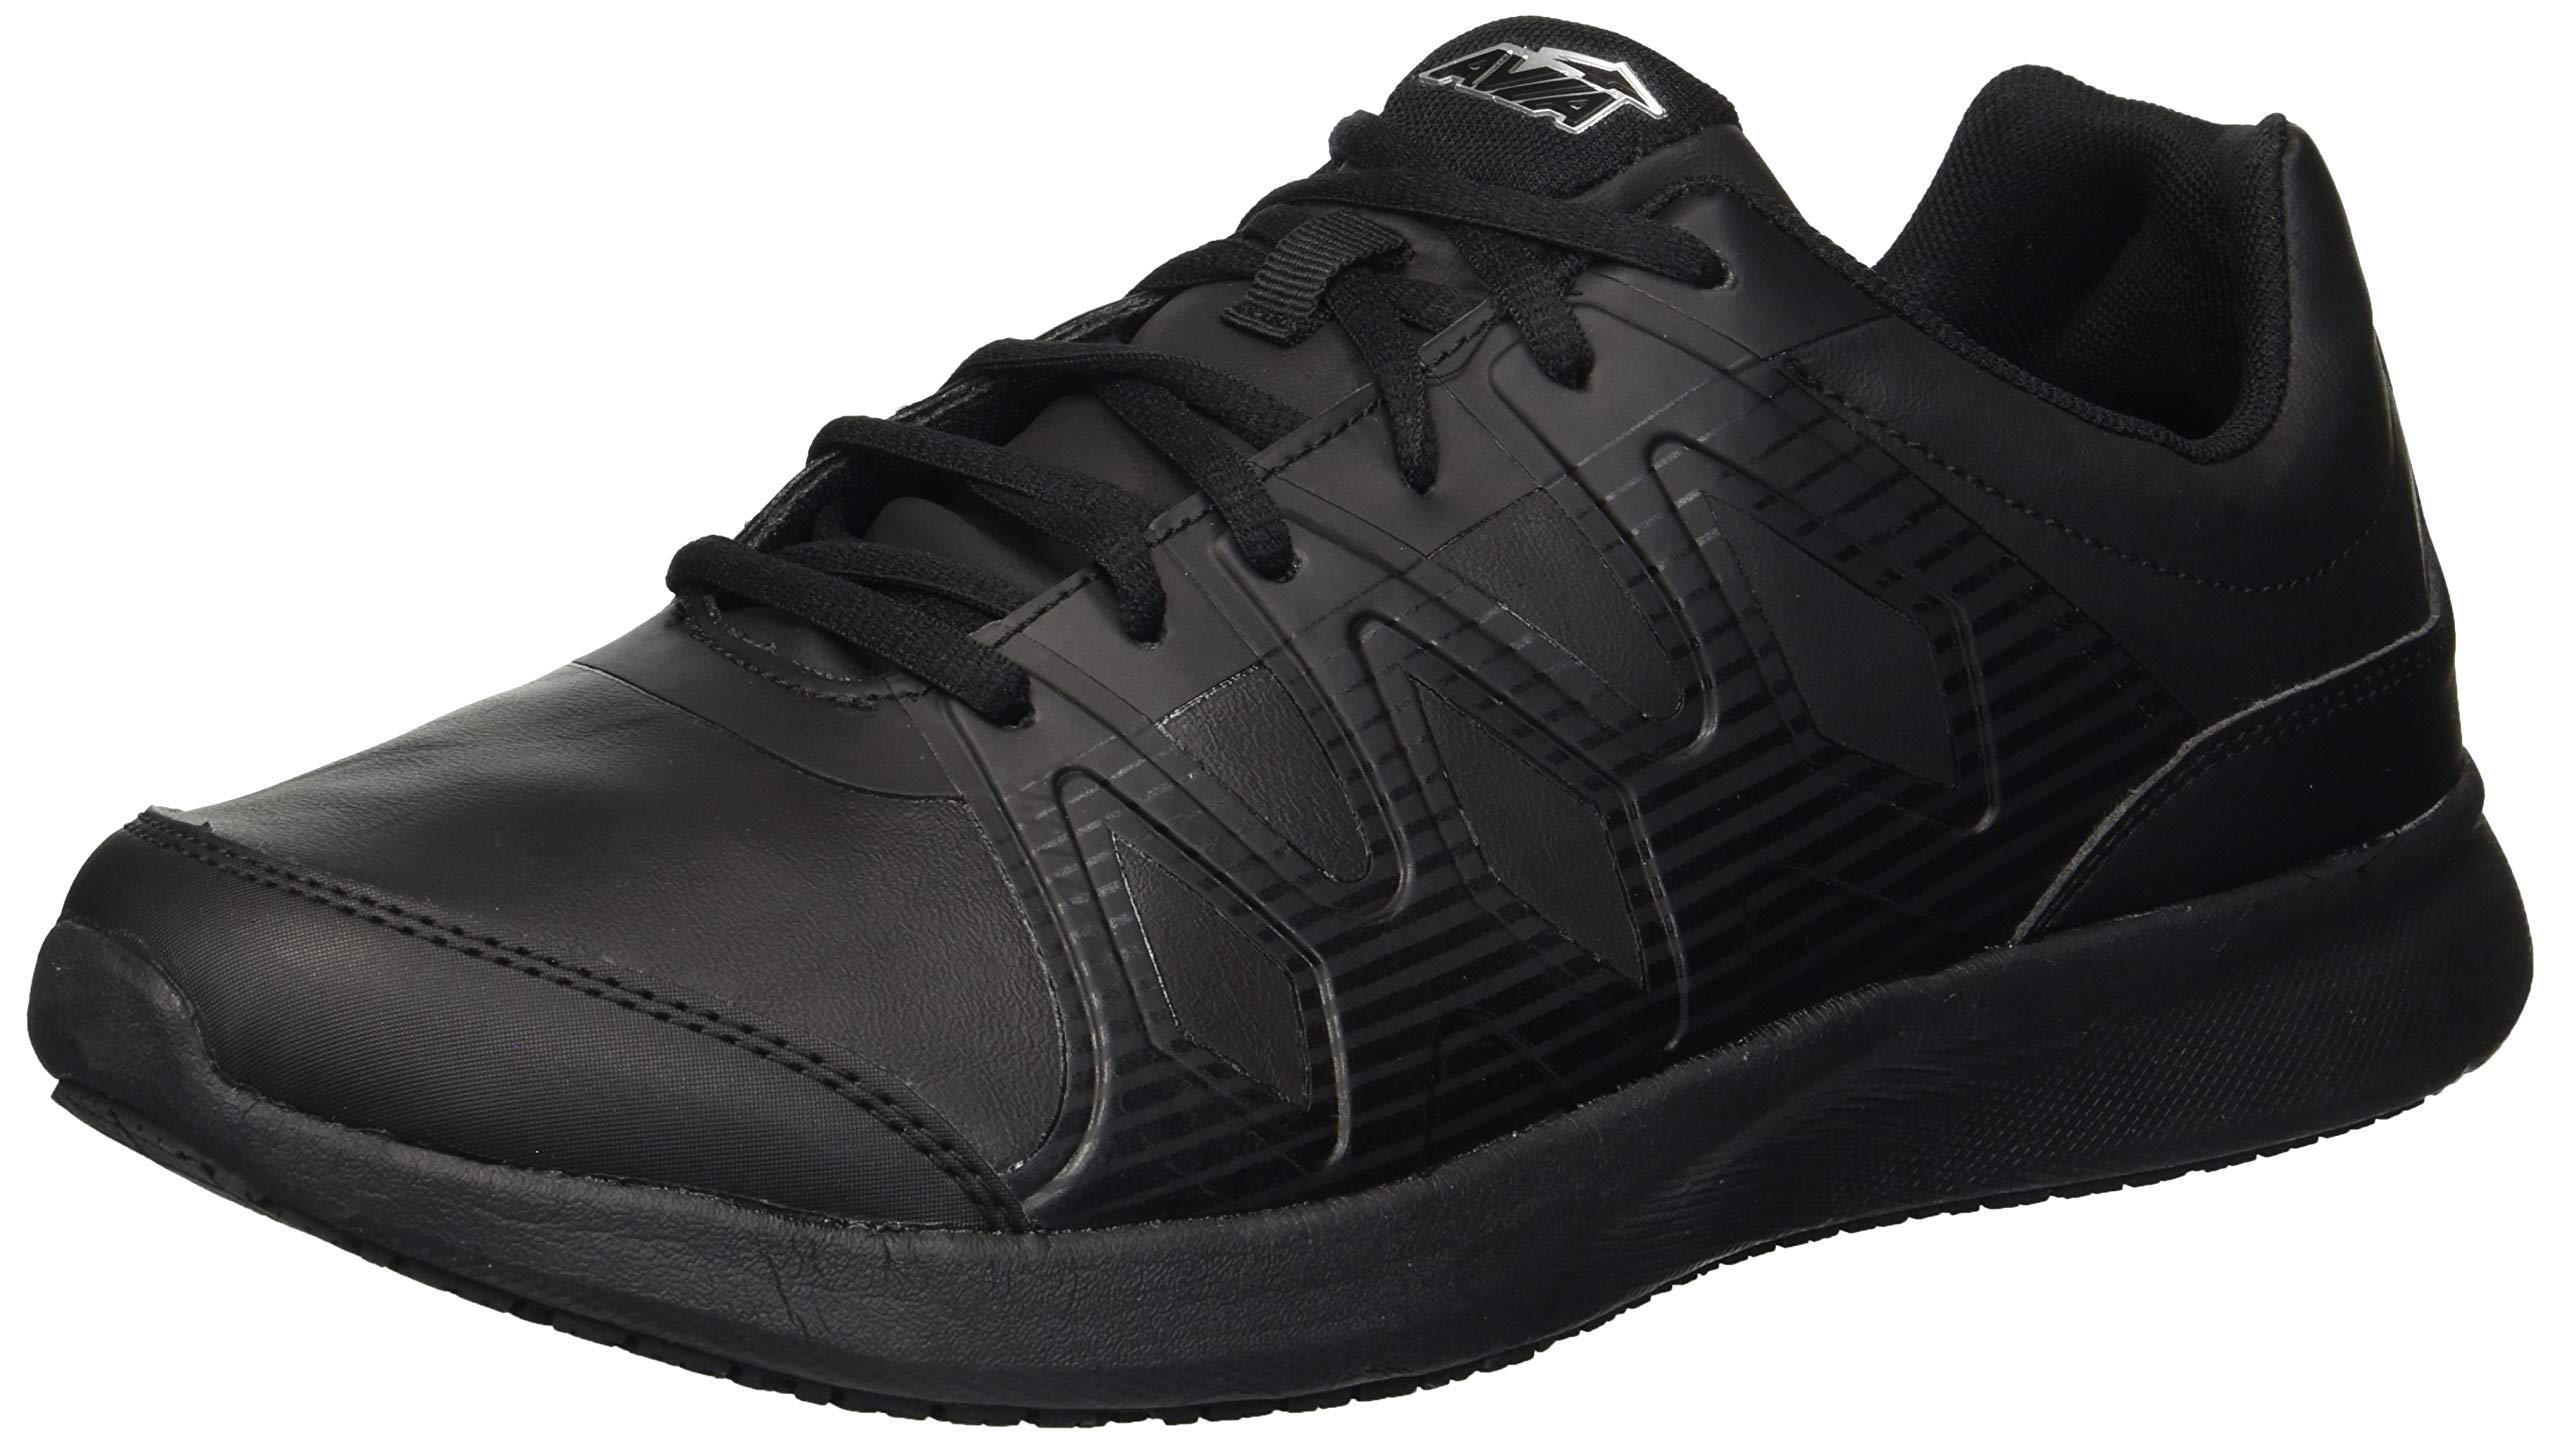 Avia Men's Avi-Skill Food Service Shoe, Black, 11 Medium US by Avia